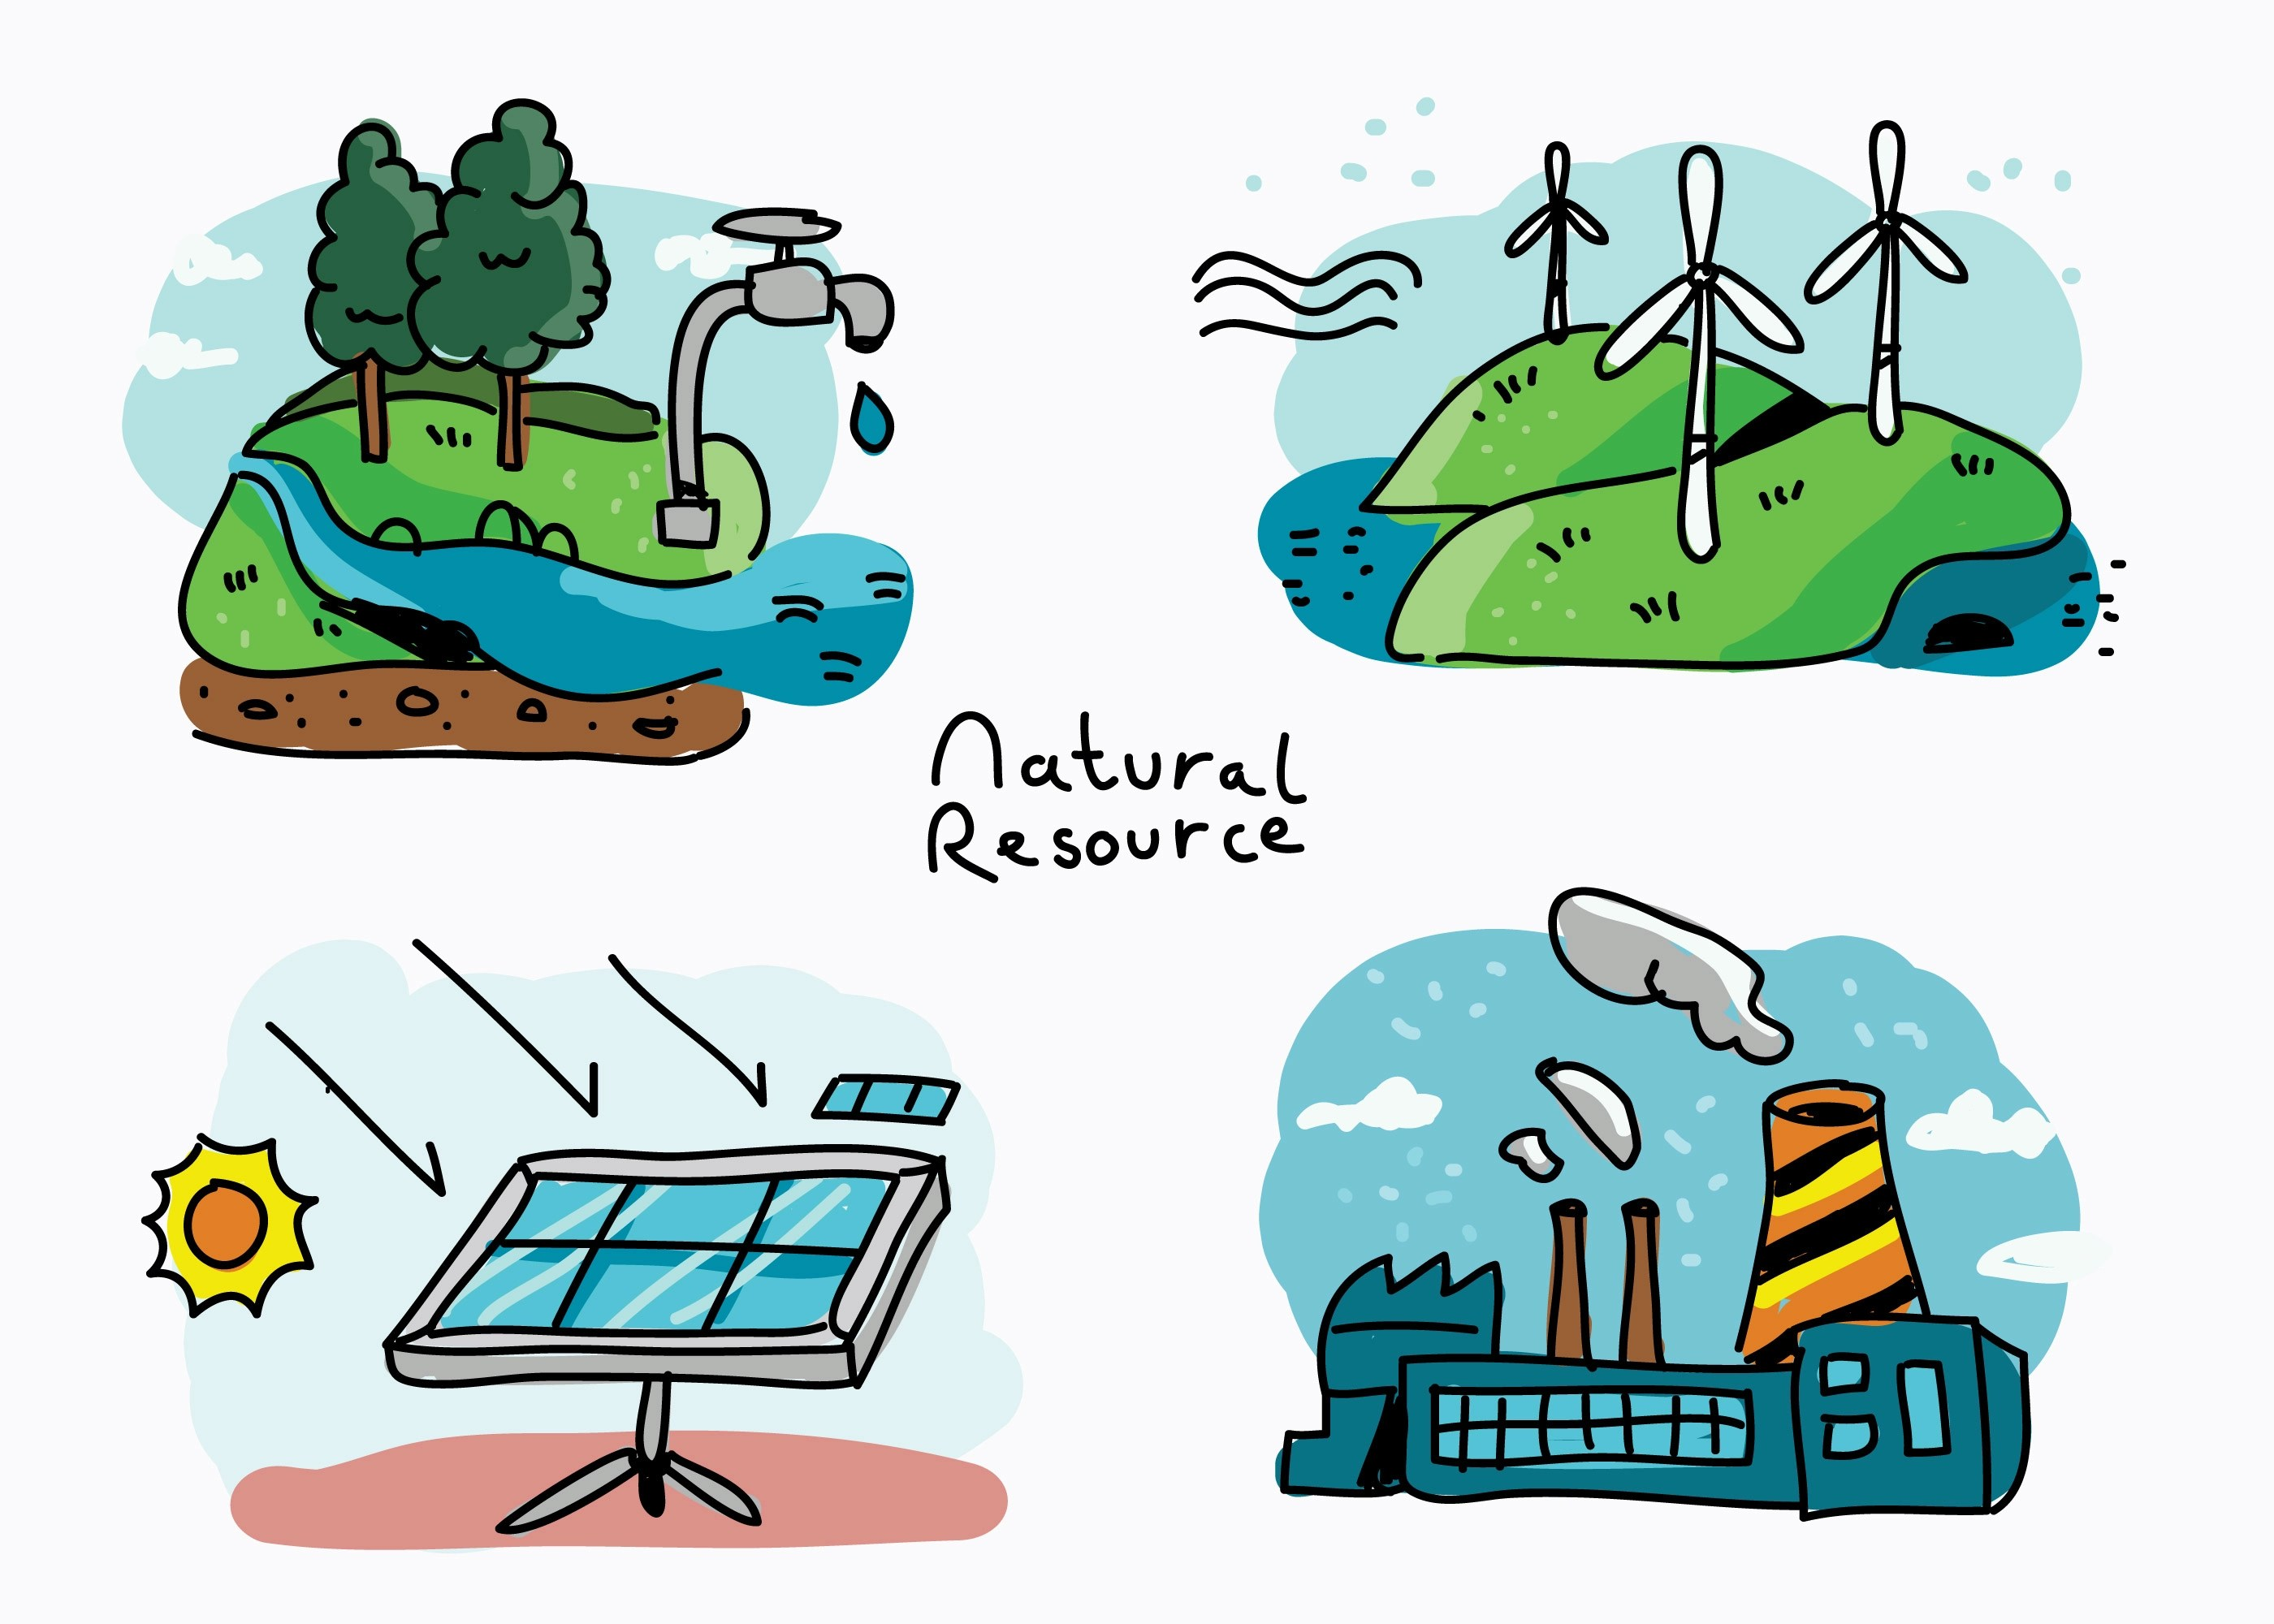 Natural Resource Hand Drawn Vector Illustration Download Free Vectors Clipart Graphics Vector Art